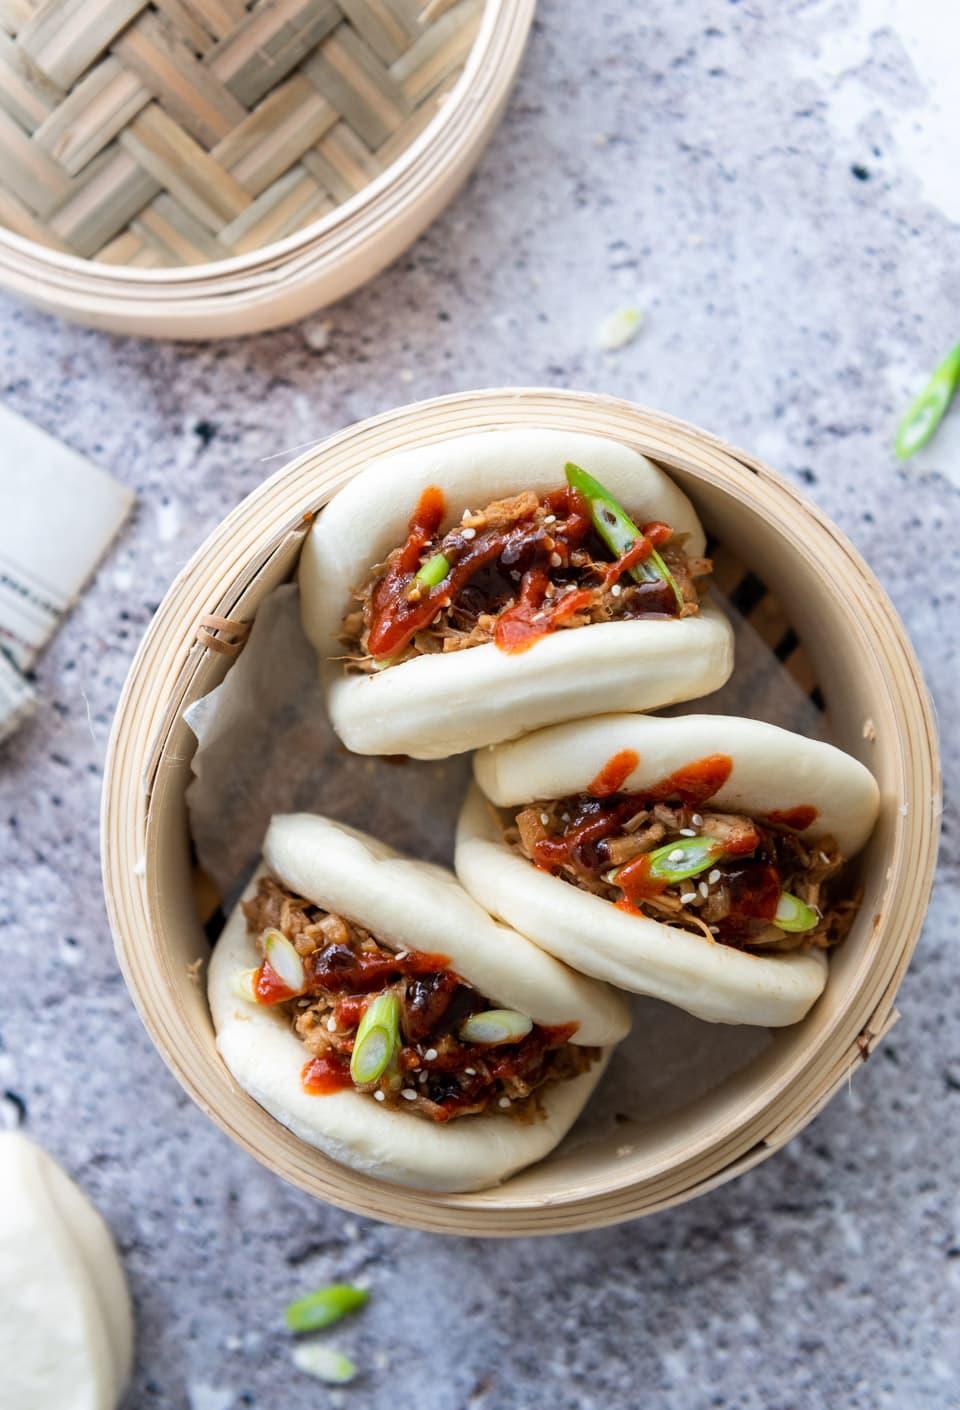 Vegan bao buns met pulled jackfruit